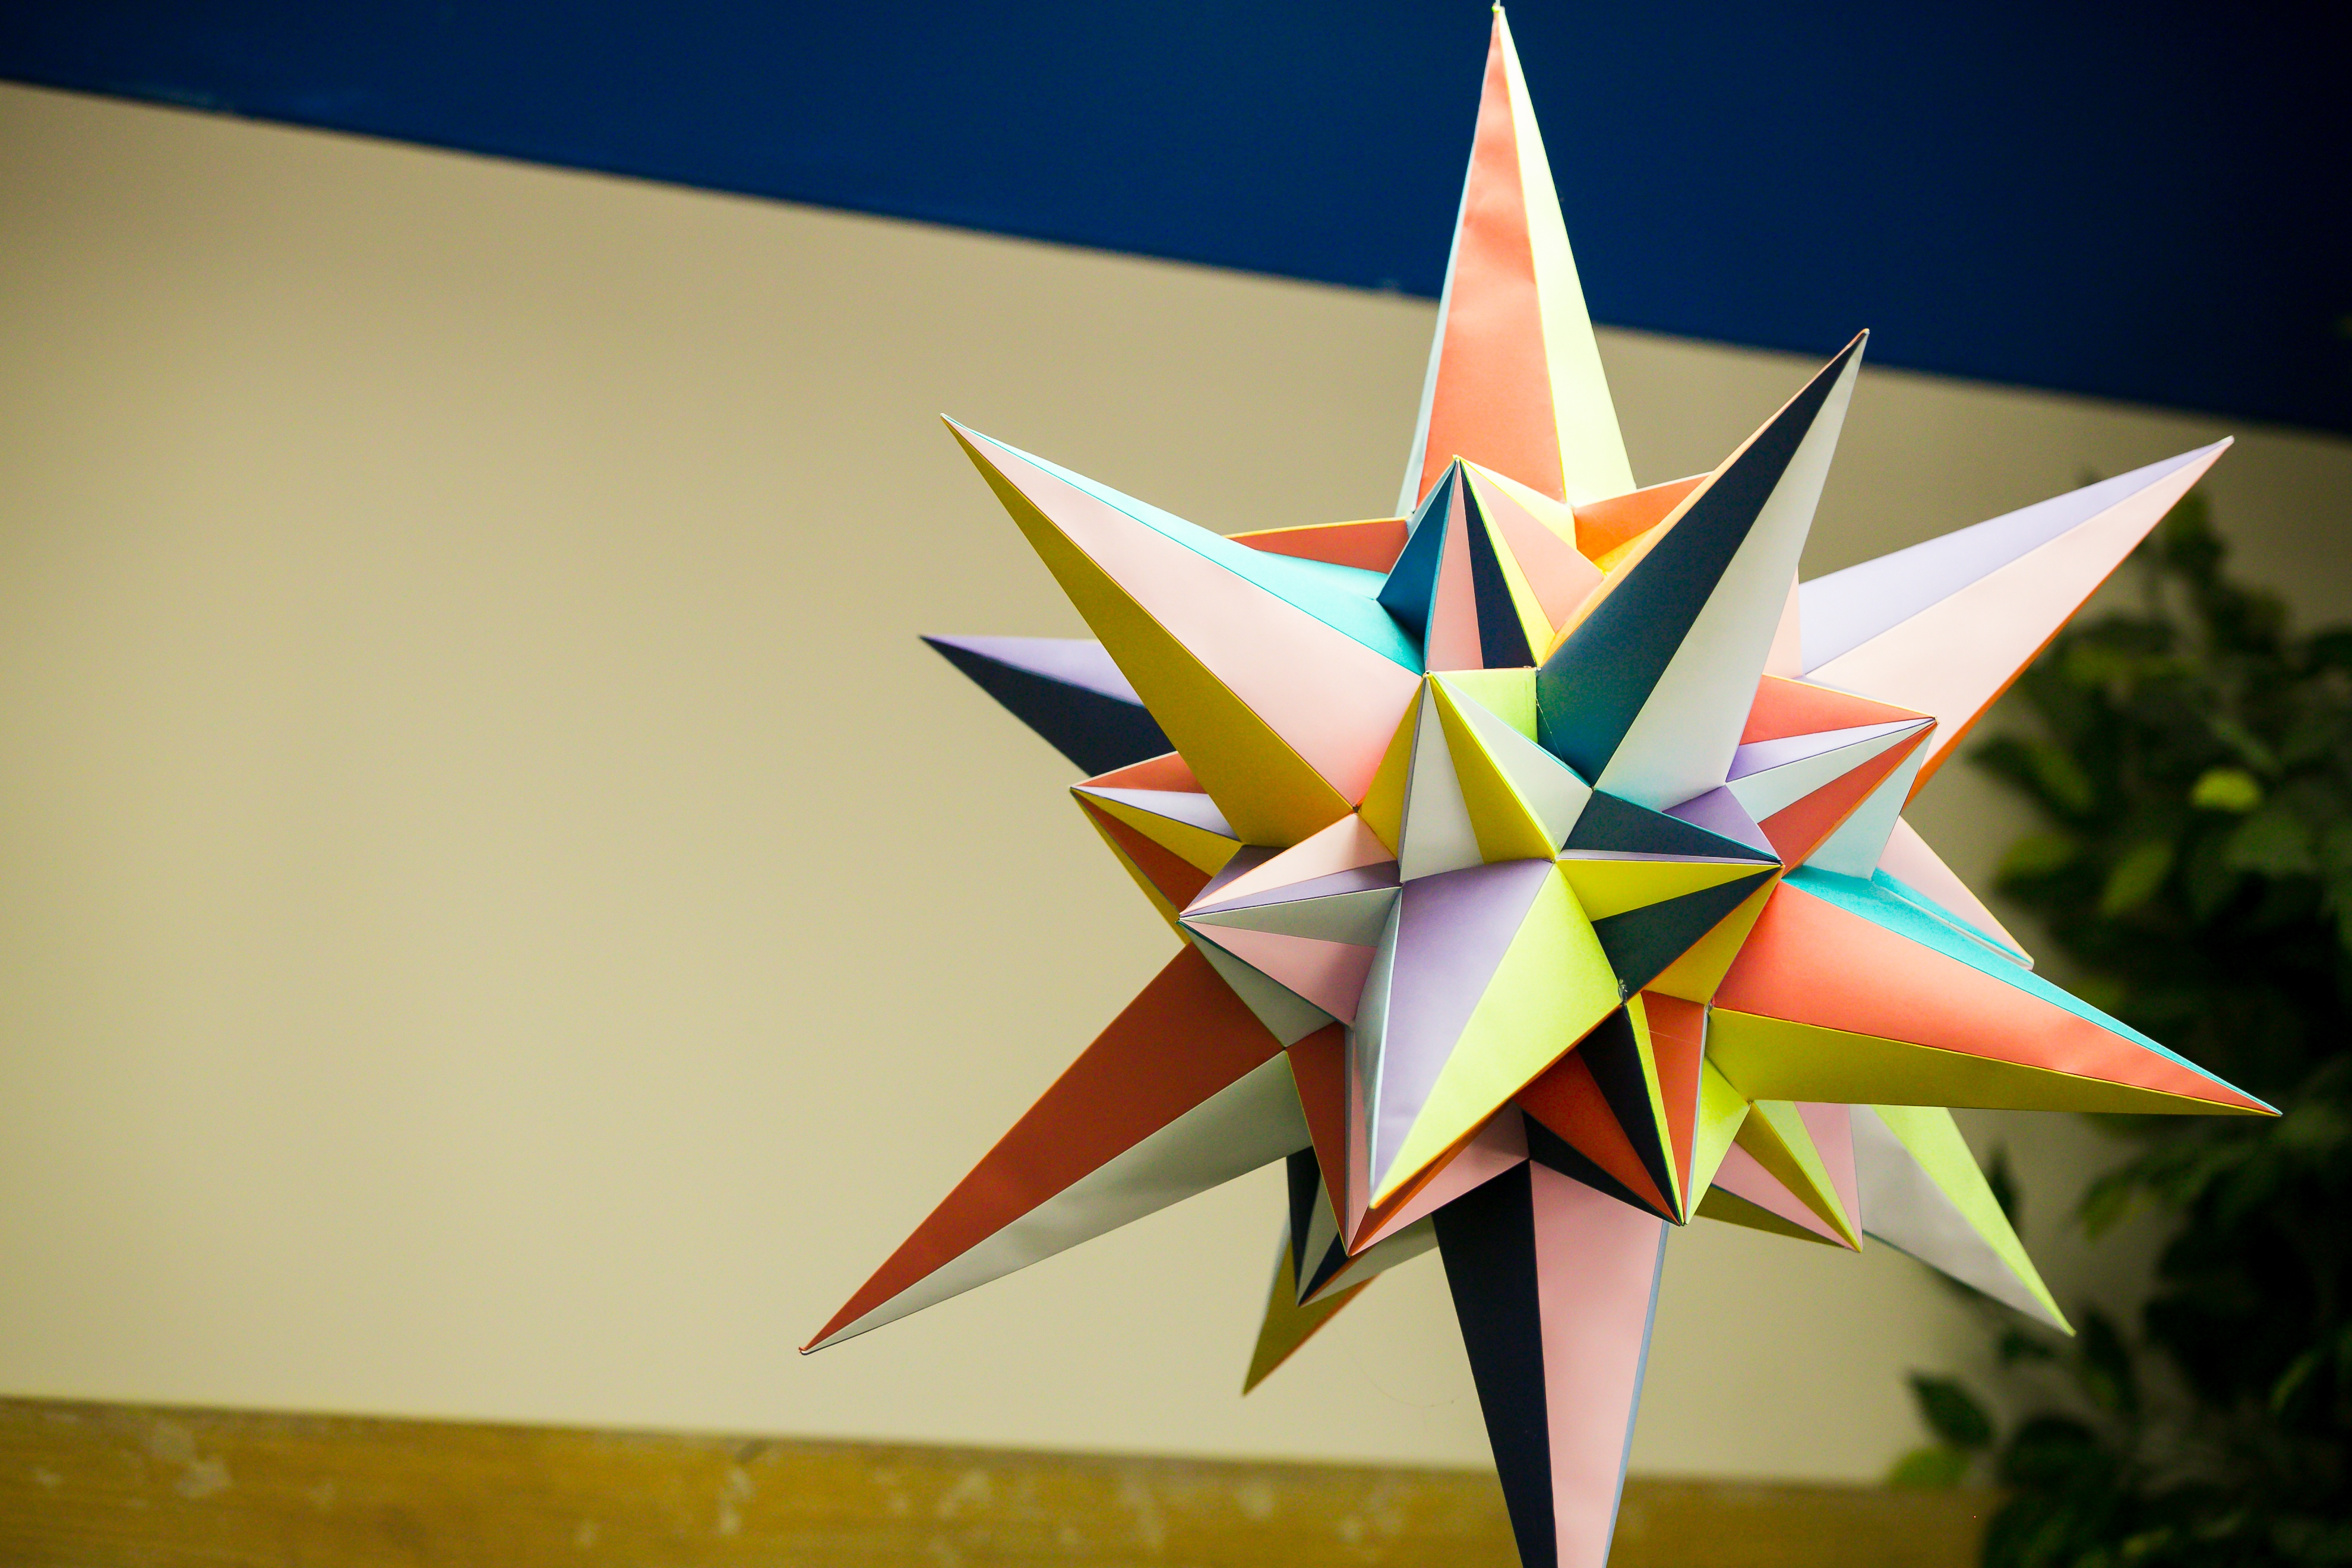 Geometrical Shapes | Veritas Academy | Classical Christian School